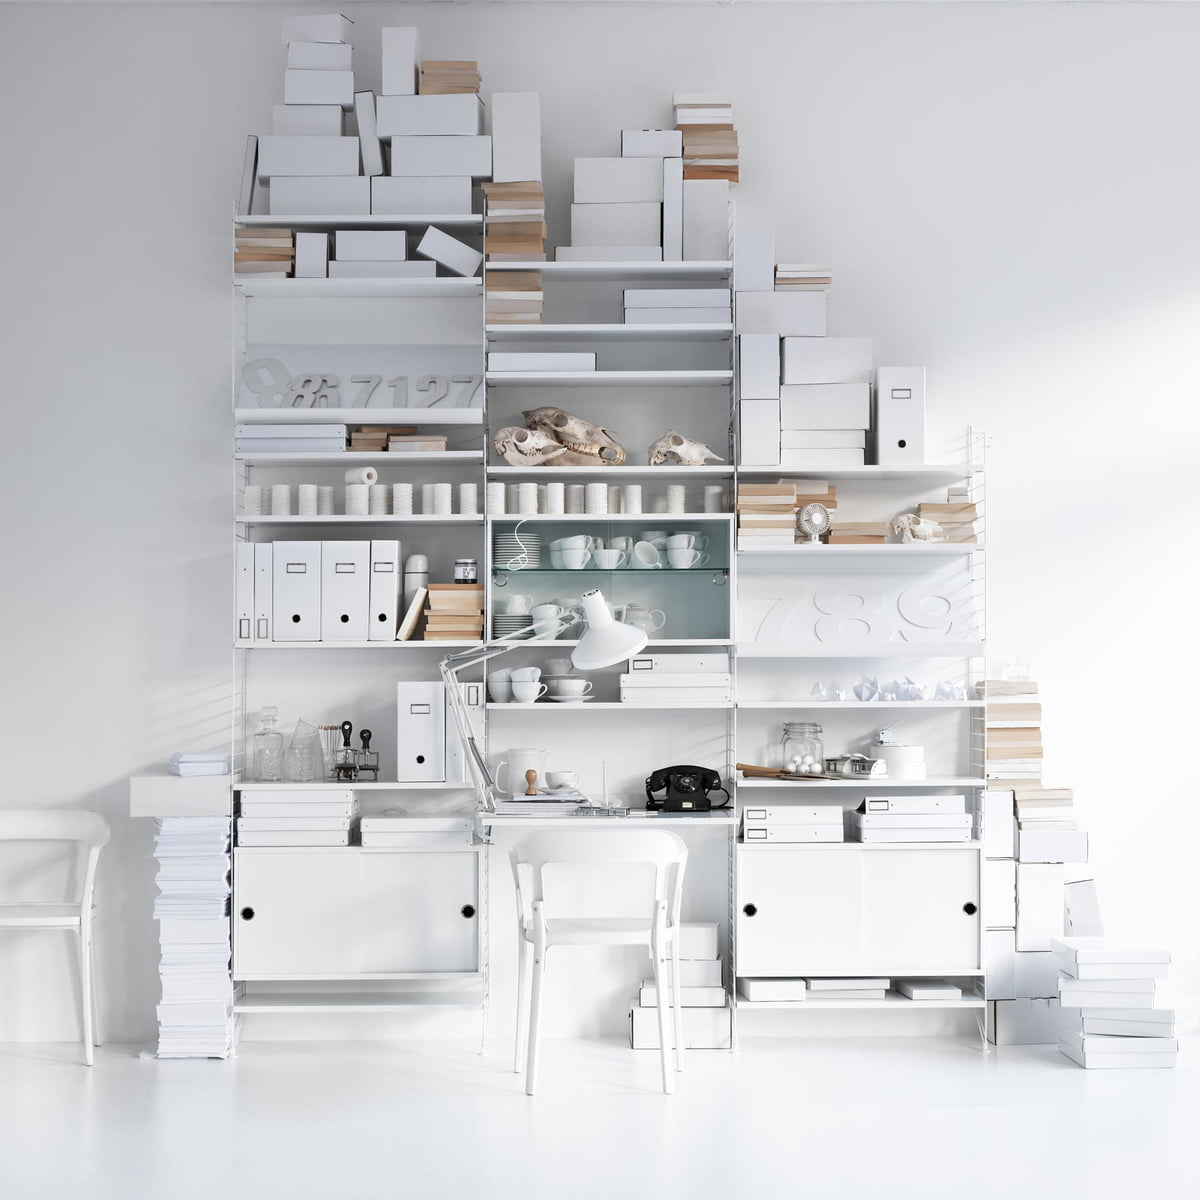 shelving system by string connox shop. Black Bedroom Furniture Sets. Home Design Ideas